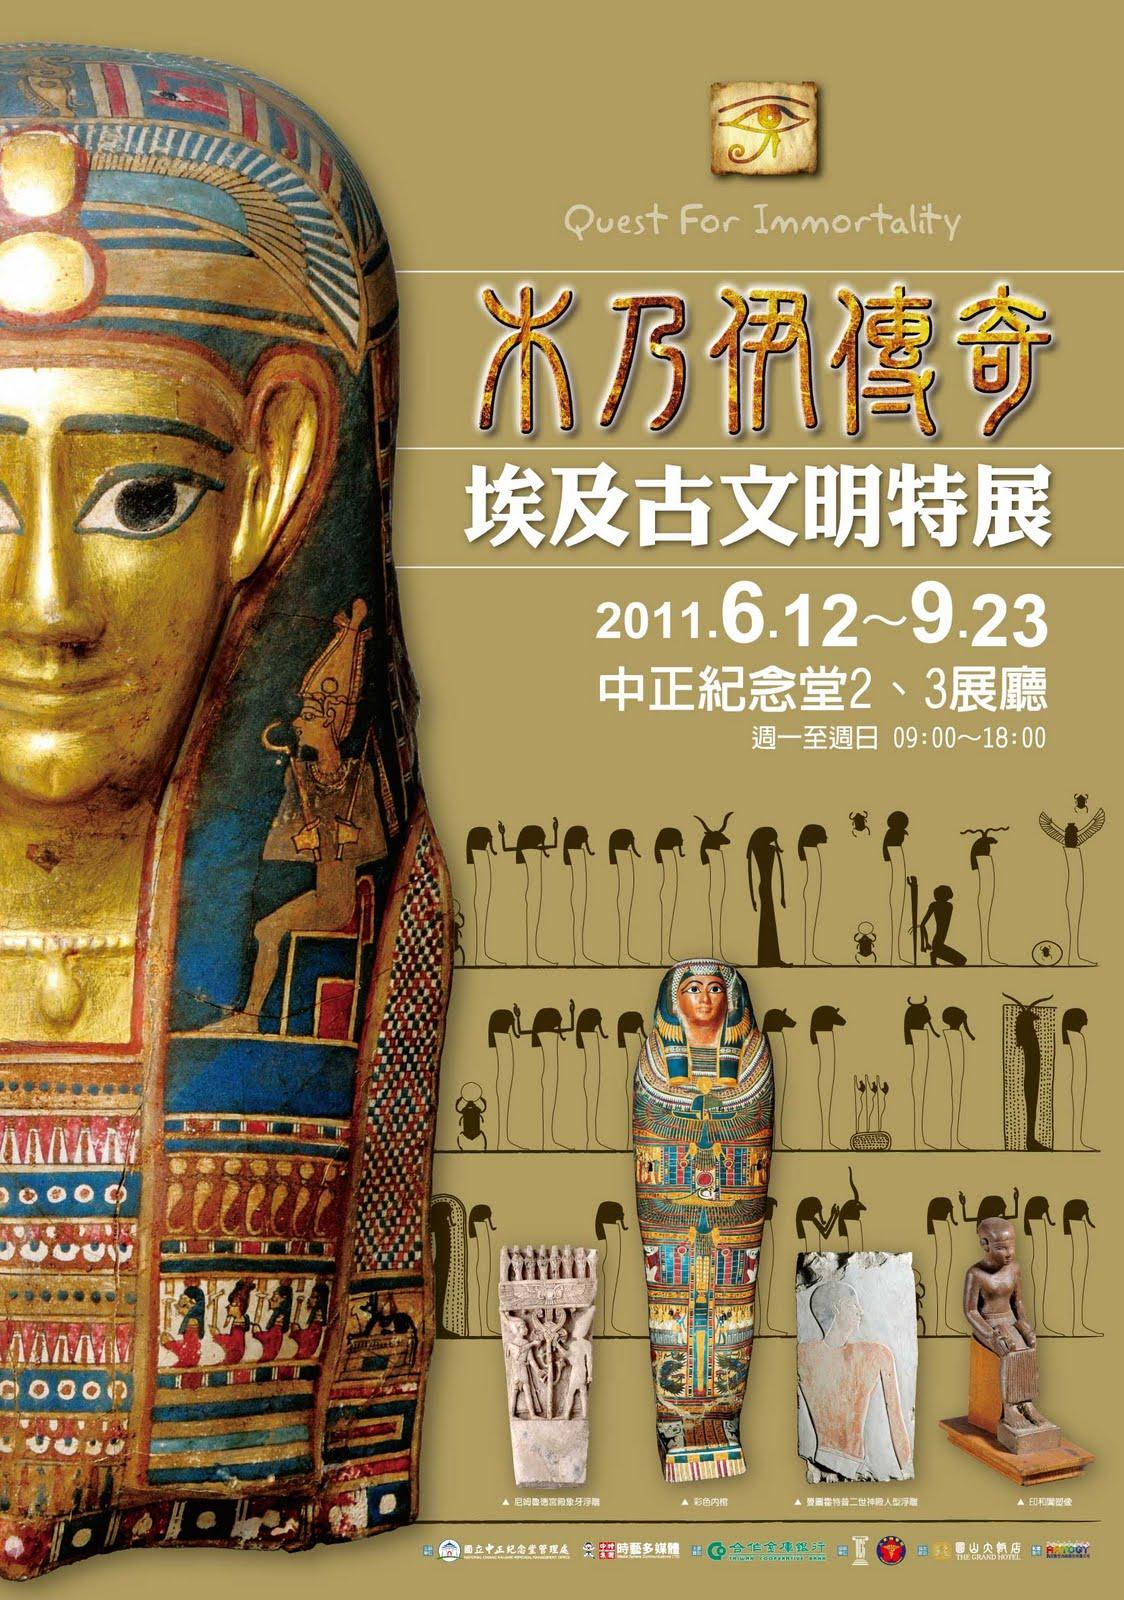 藍色微風: 埃及古文明特展 Quest For Immortality - 令人著迷的古埃及文化